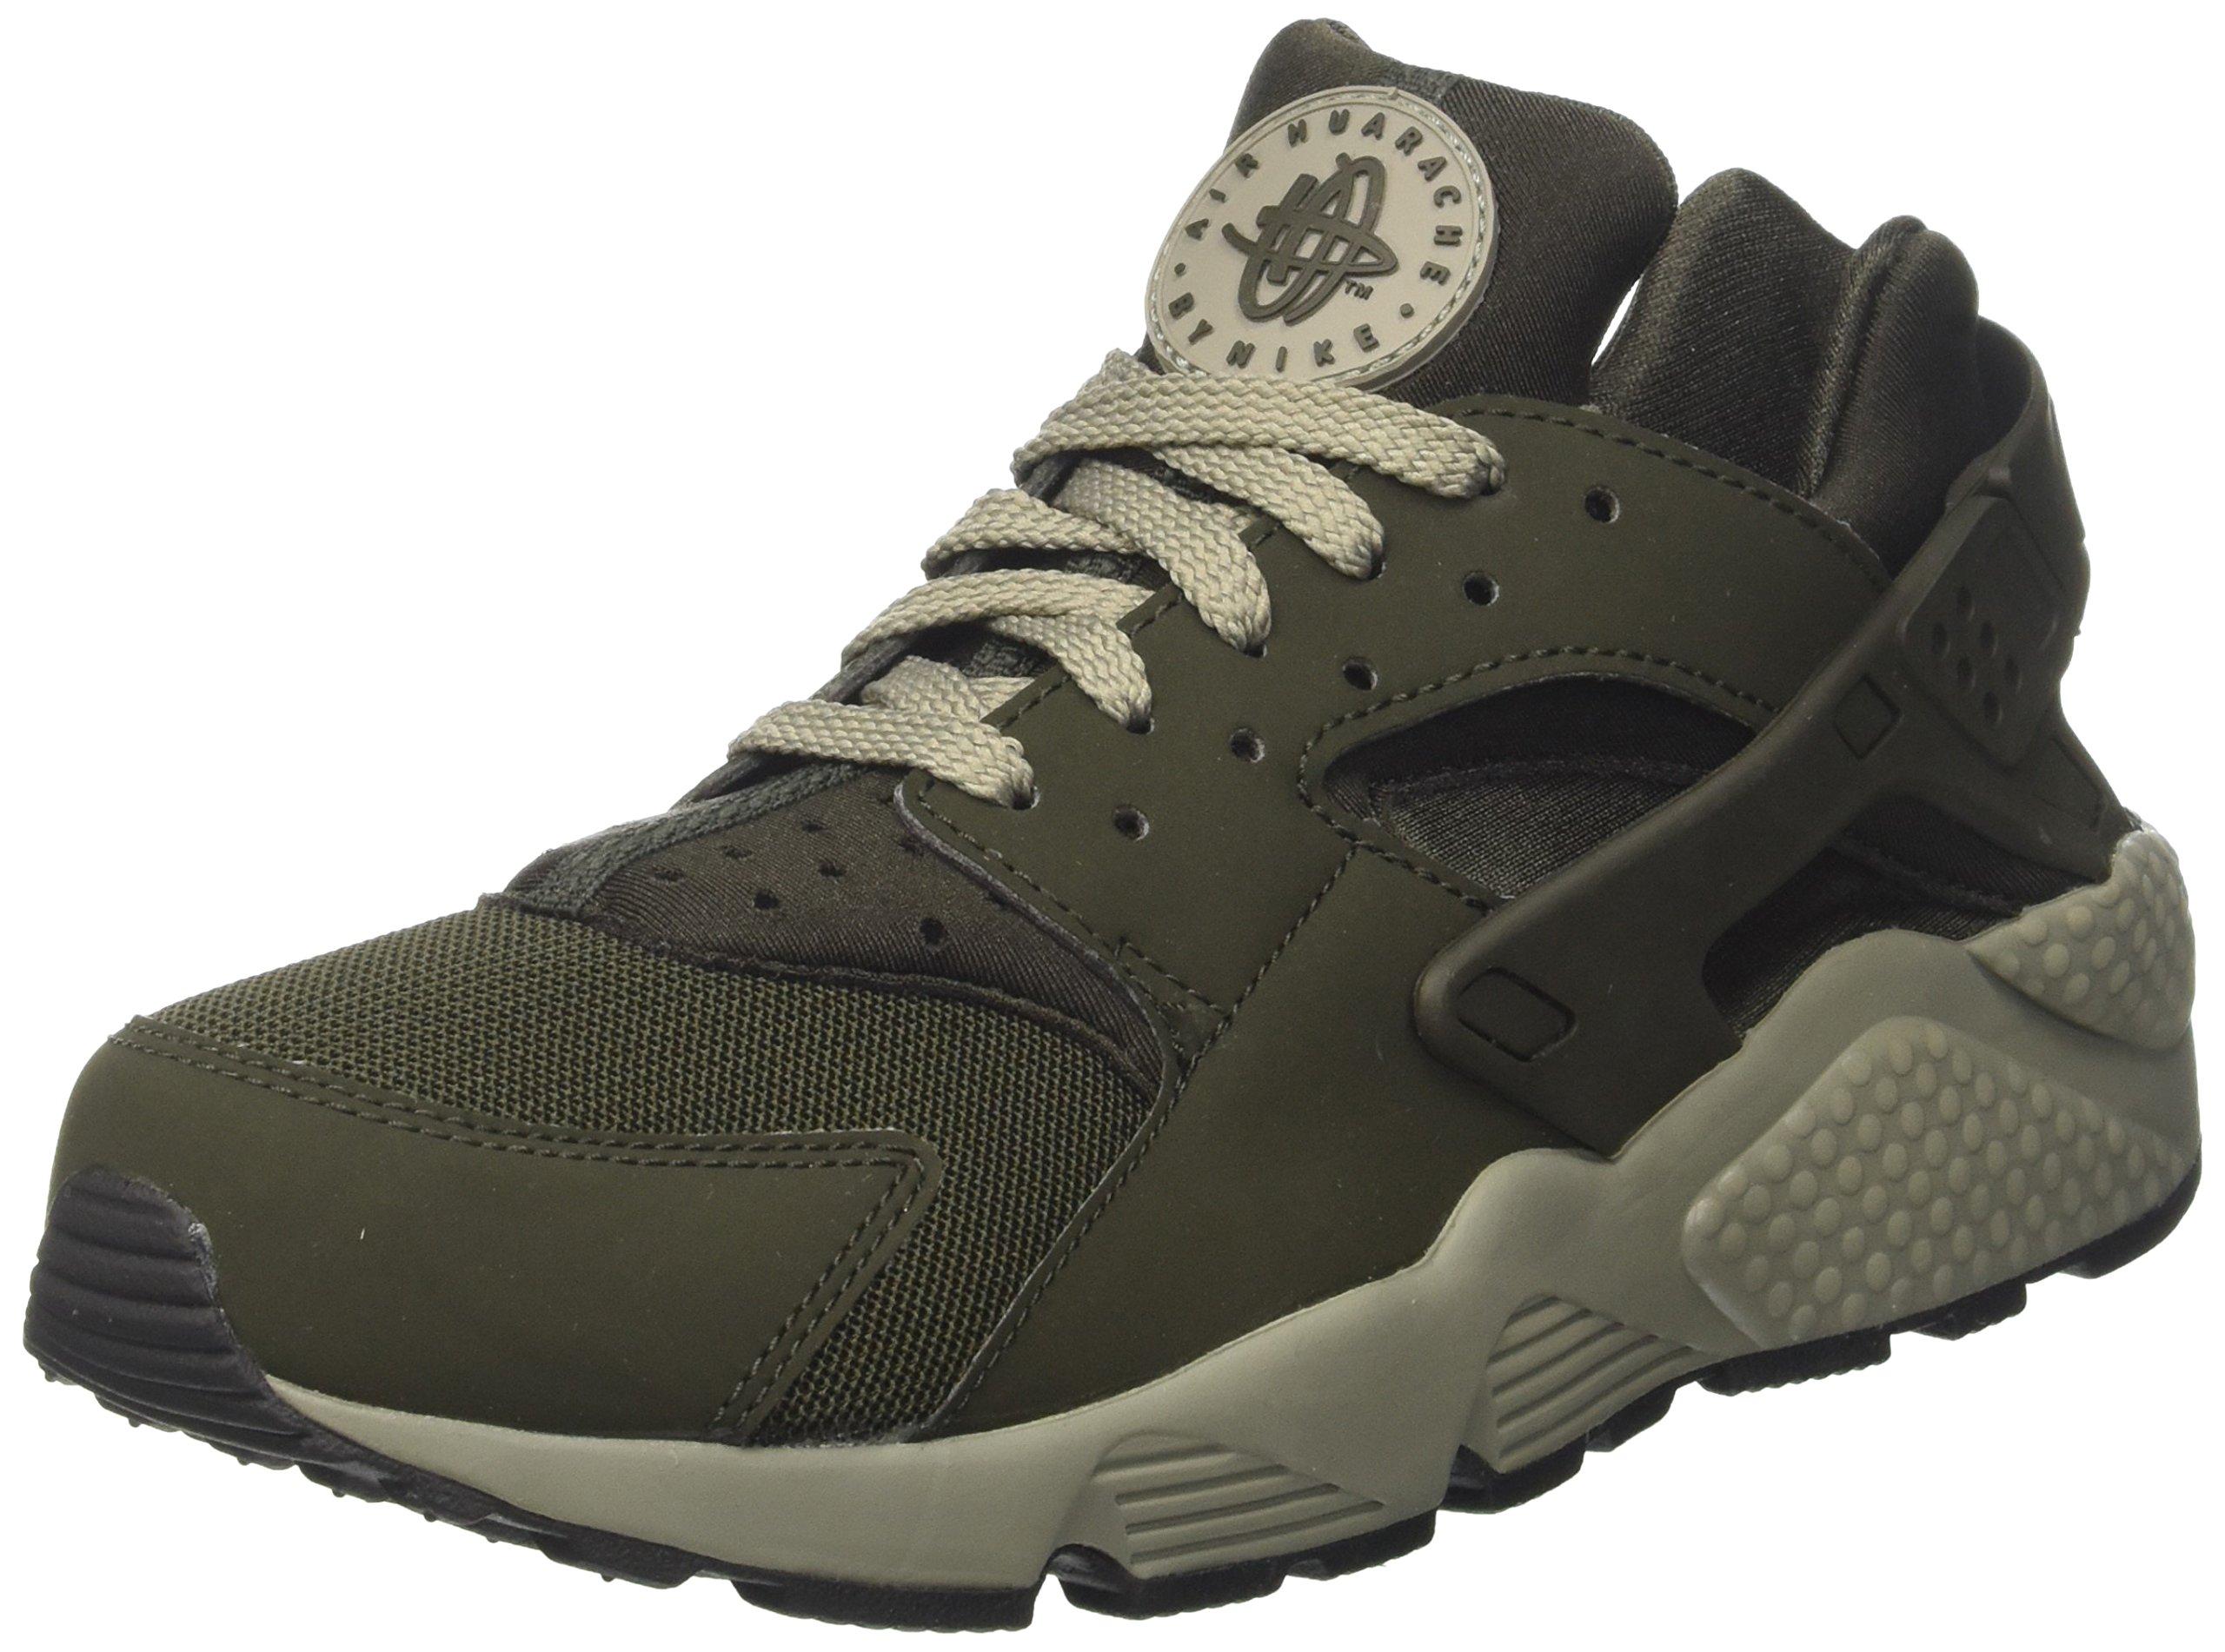 new arrive f6f67 62fcd Galleon - Nike Air Huarache Mens Running Shoes Sequoia Sequoia Dark Stucco  318429-311 (13 D(M) US)